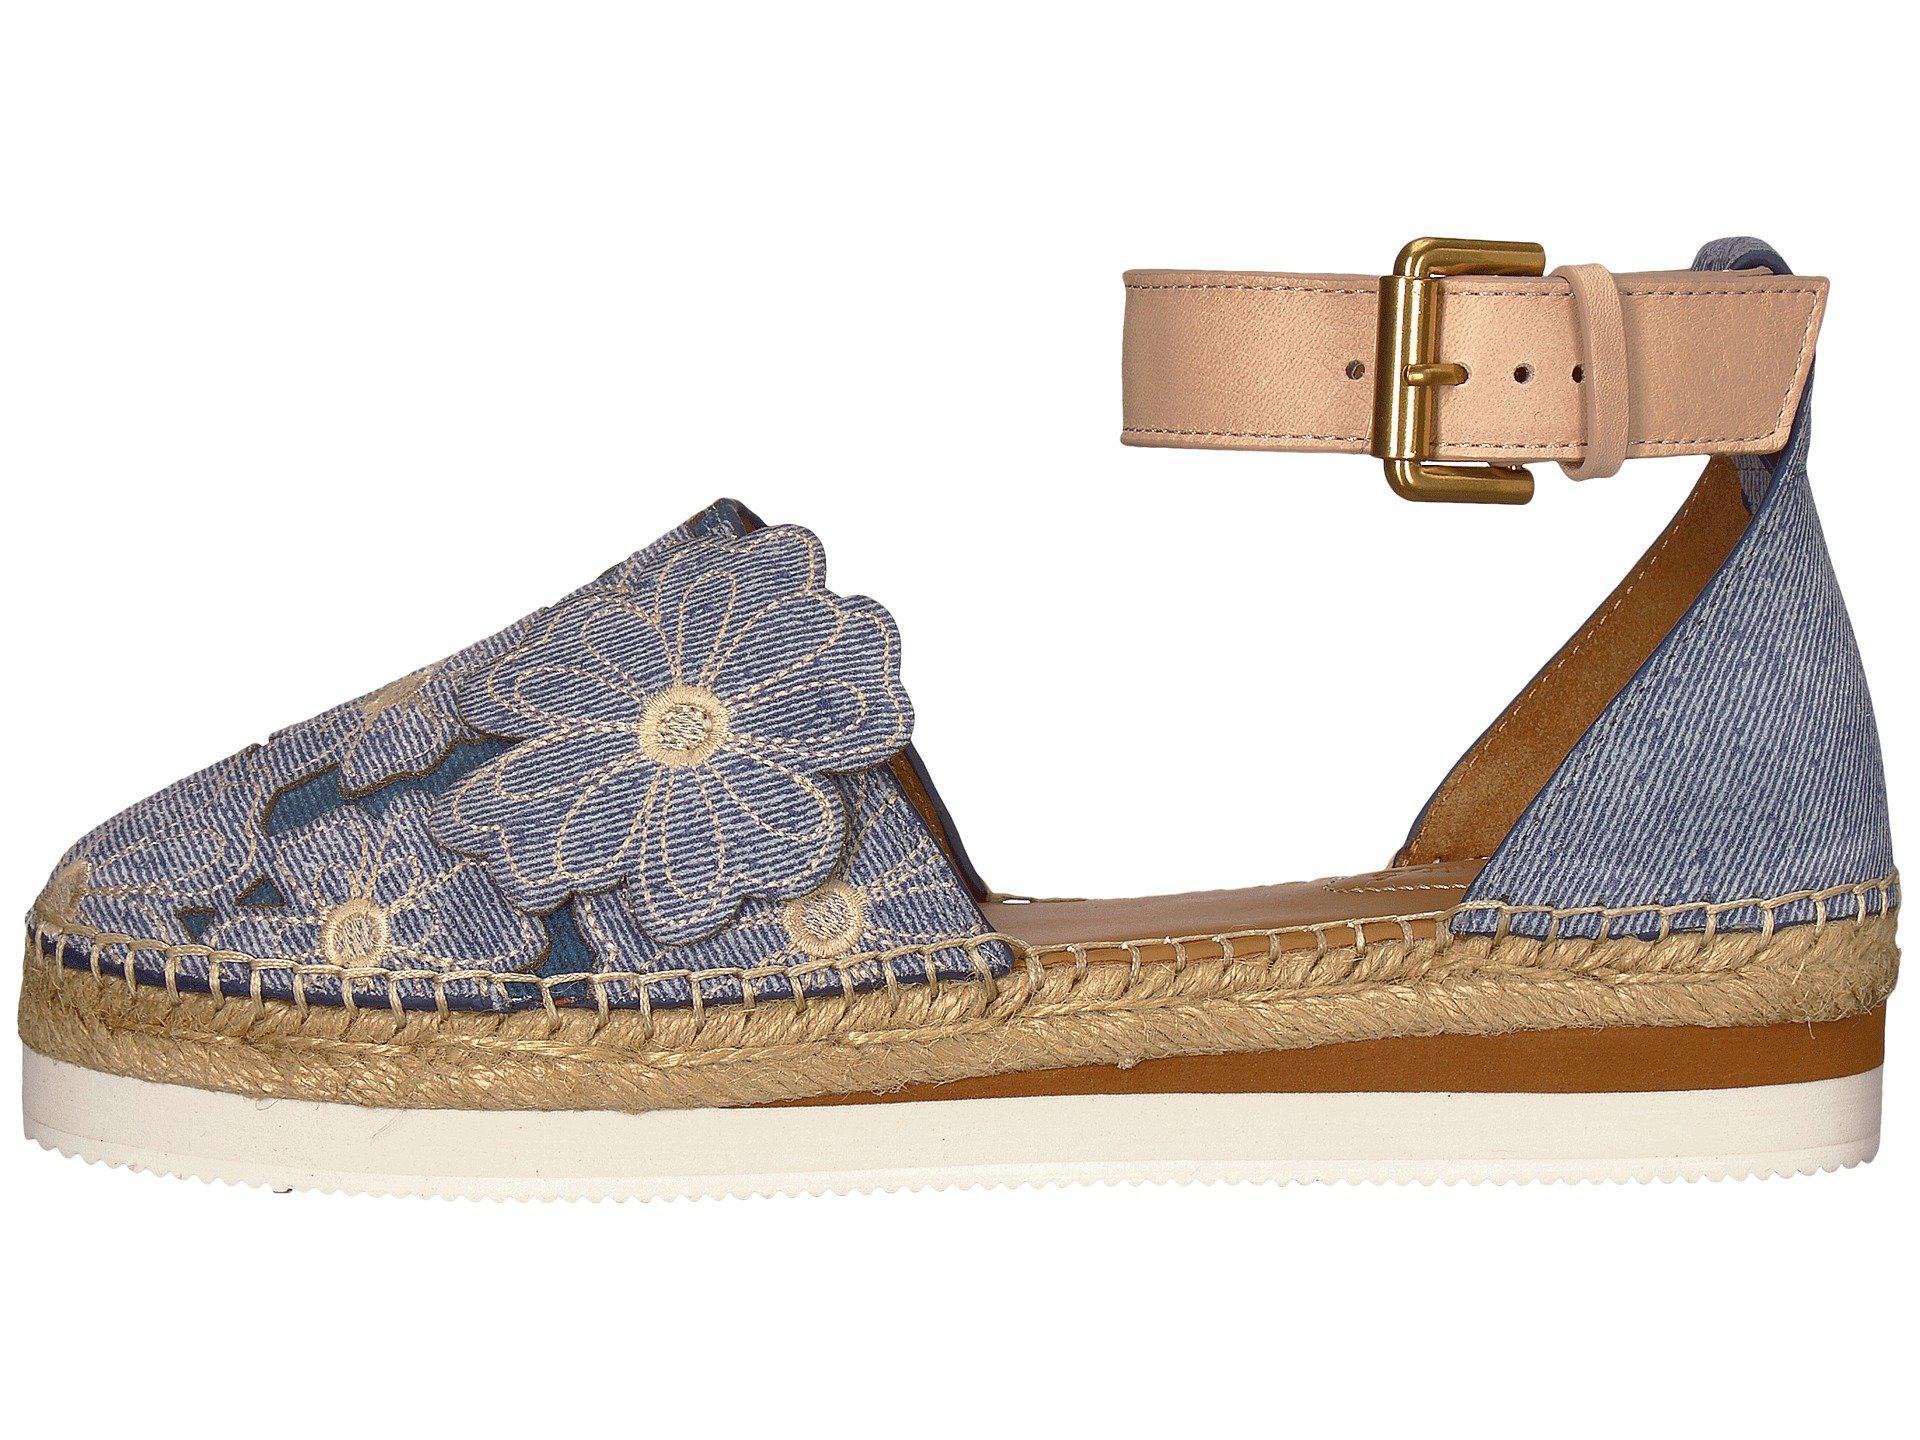 65720f2d3f55 See by Chloé SB30211 Womens Platform Sandals Blue Denim 5.5 US   3.5 ...